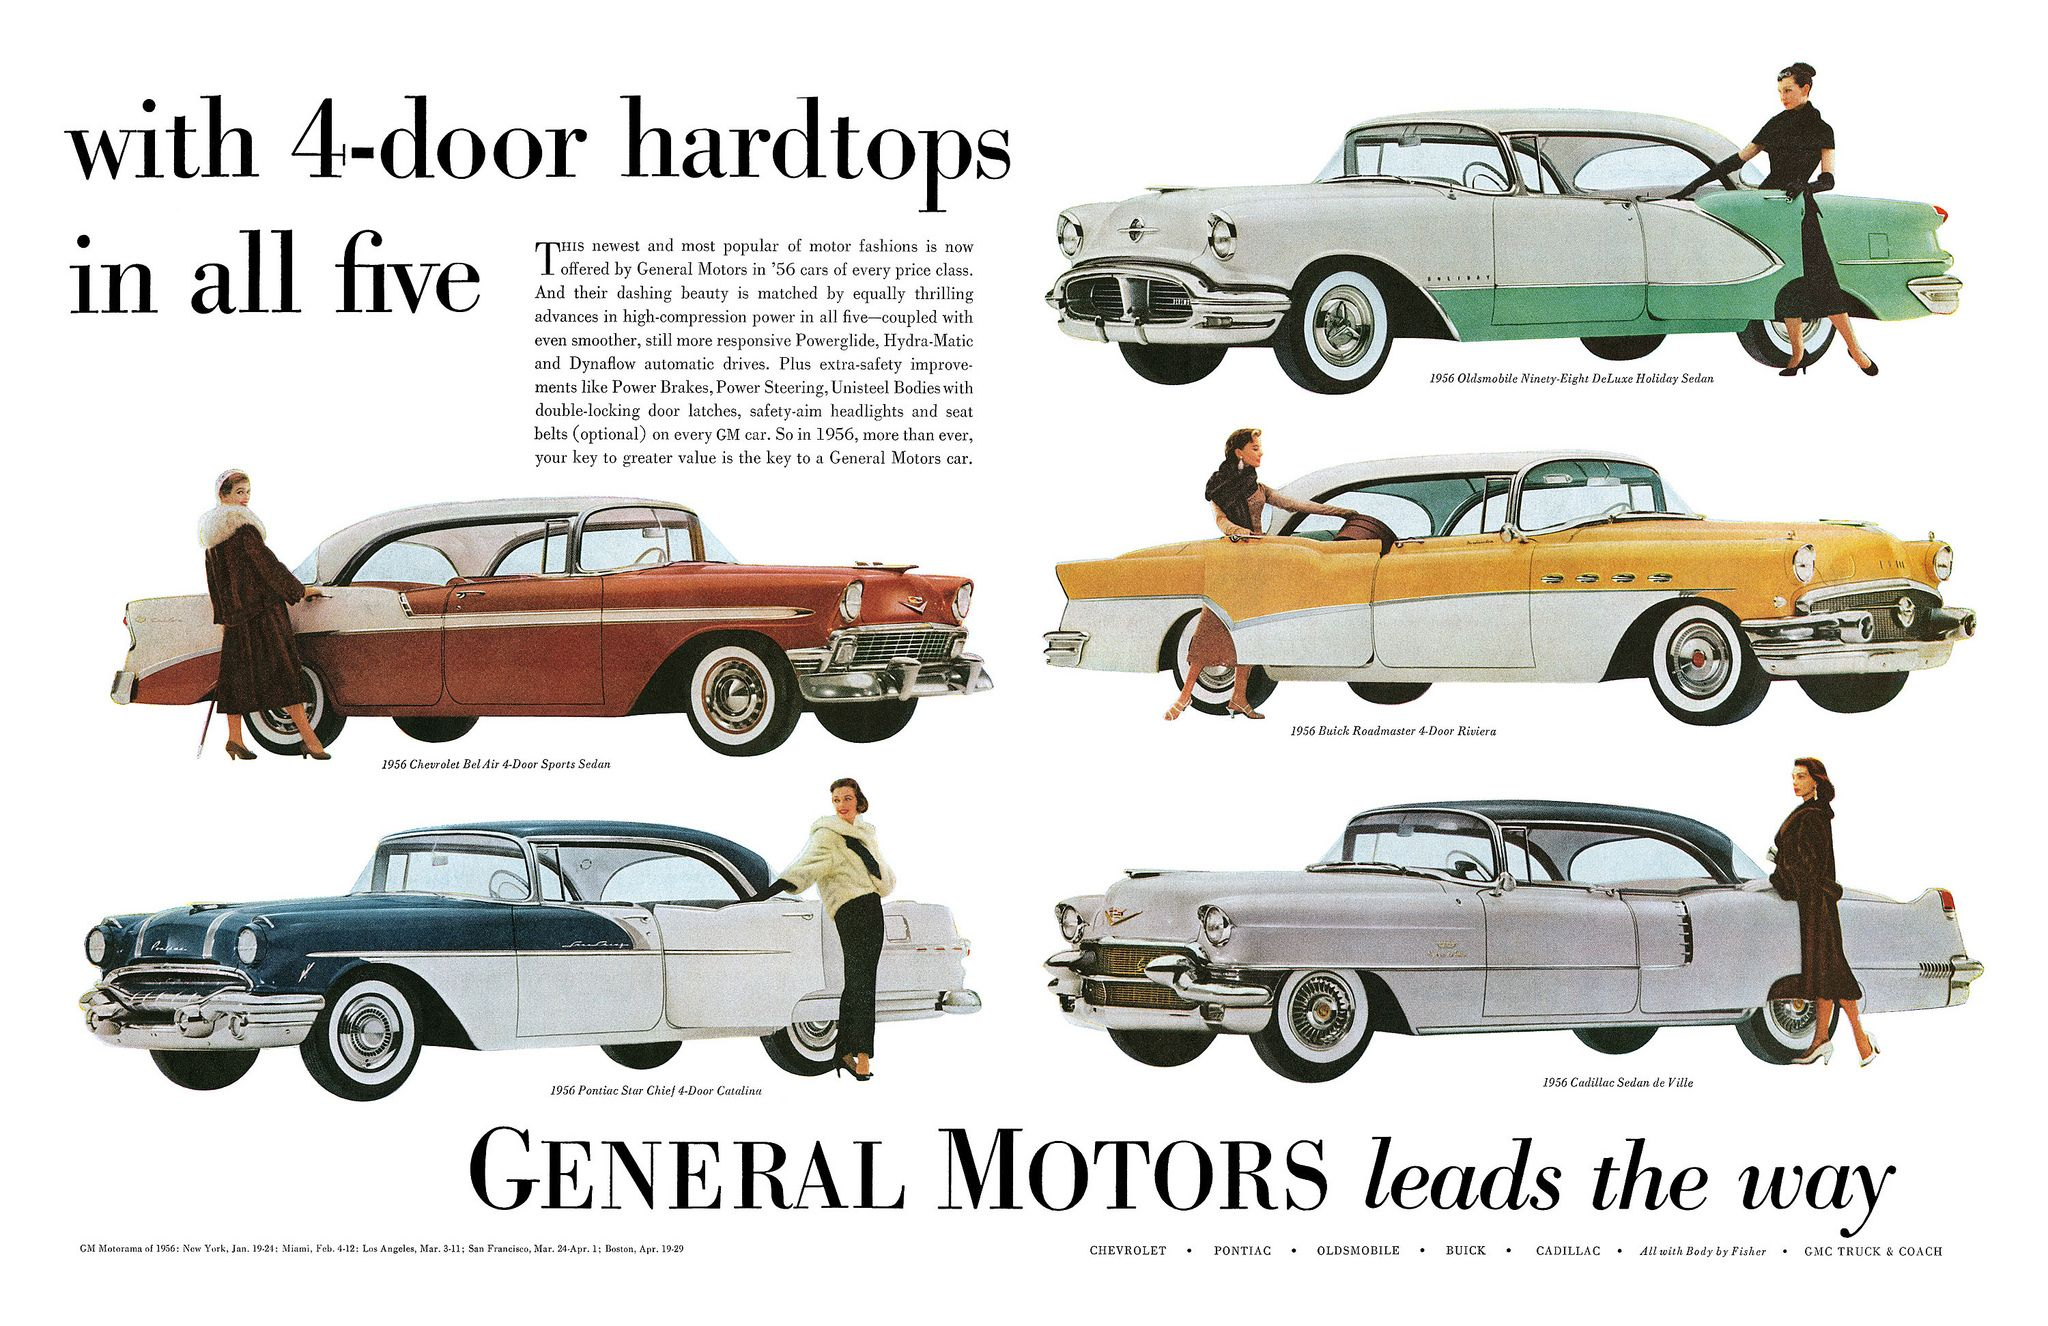 1956 General Motors General motors, Automobile